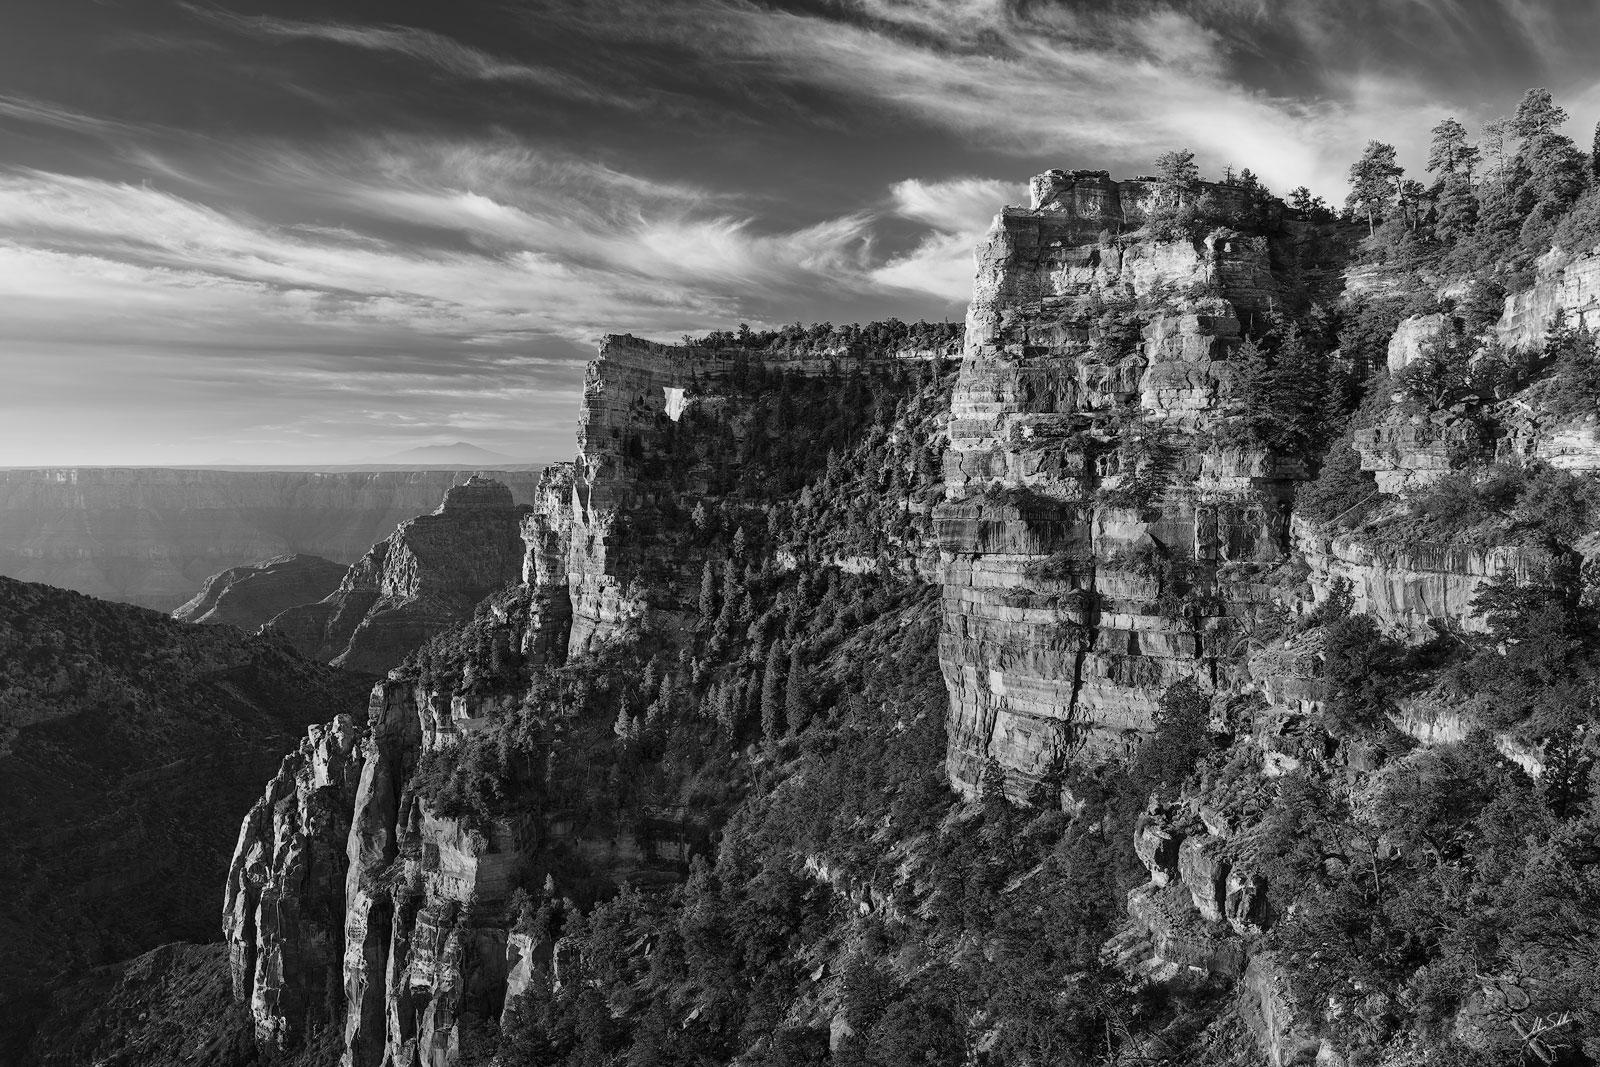 AZ, Angels Window, Arizona, Grand Canyon, Grand Canyon National Park, National Park, North Rim, North Rim of the Grand Canyon, photo